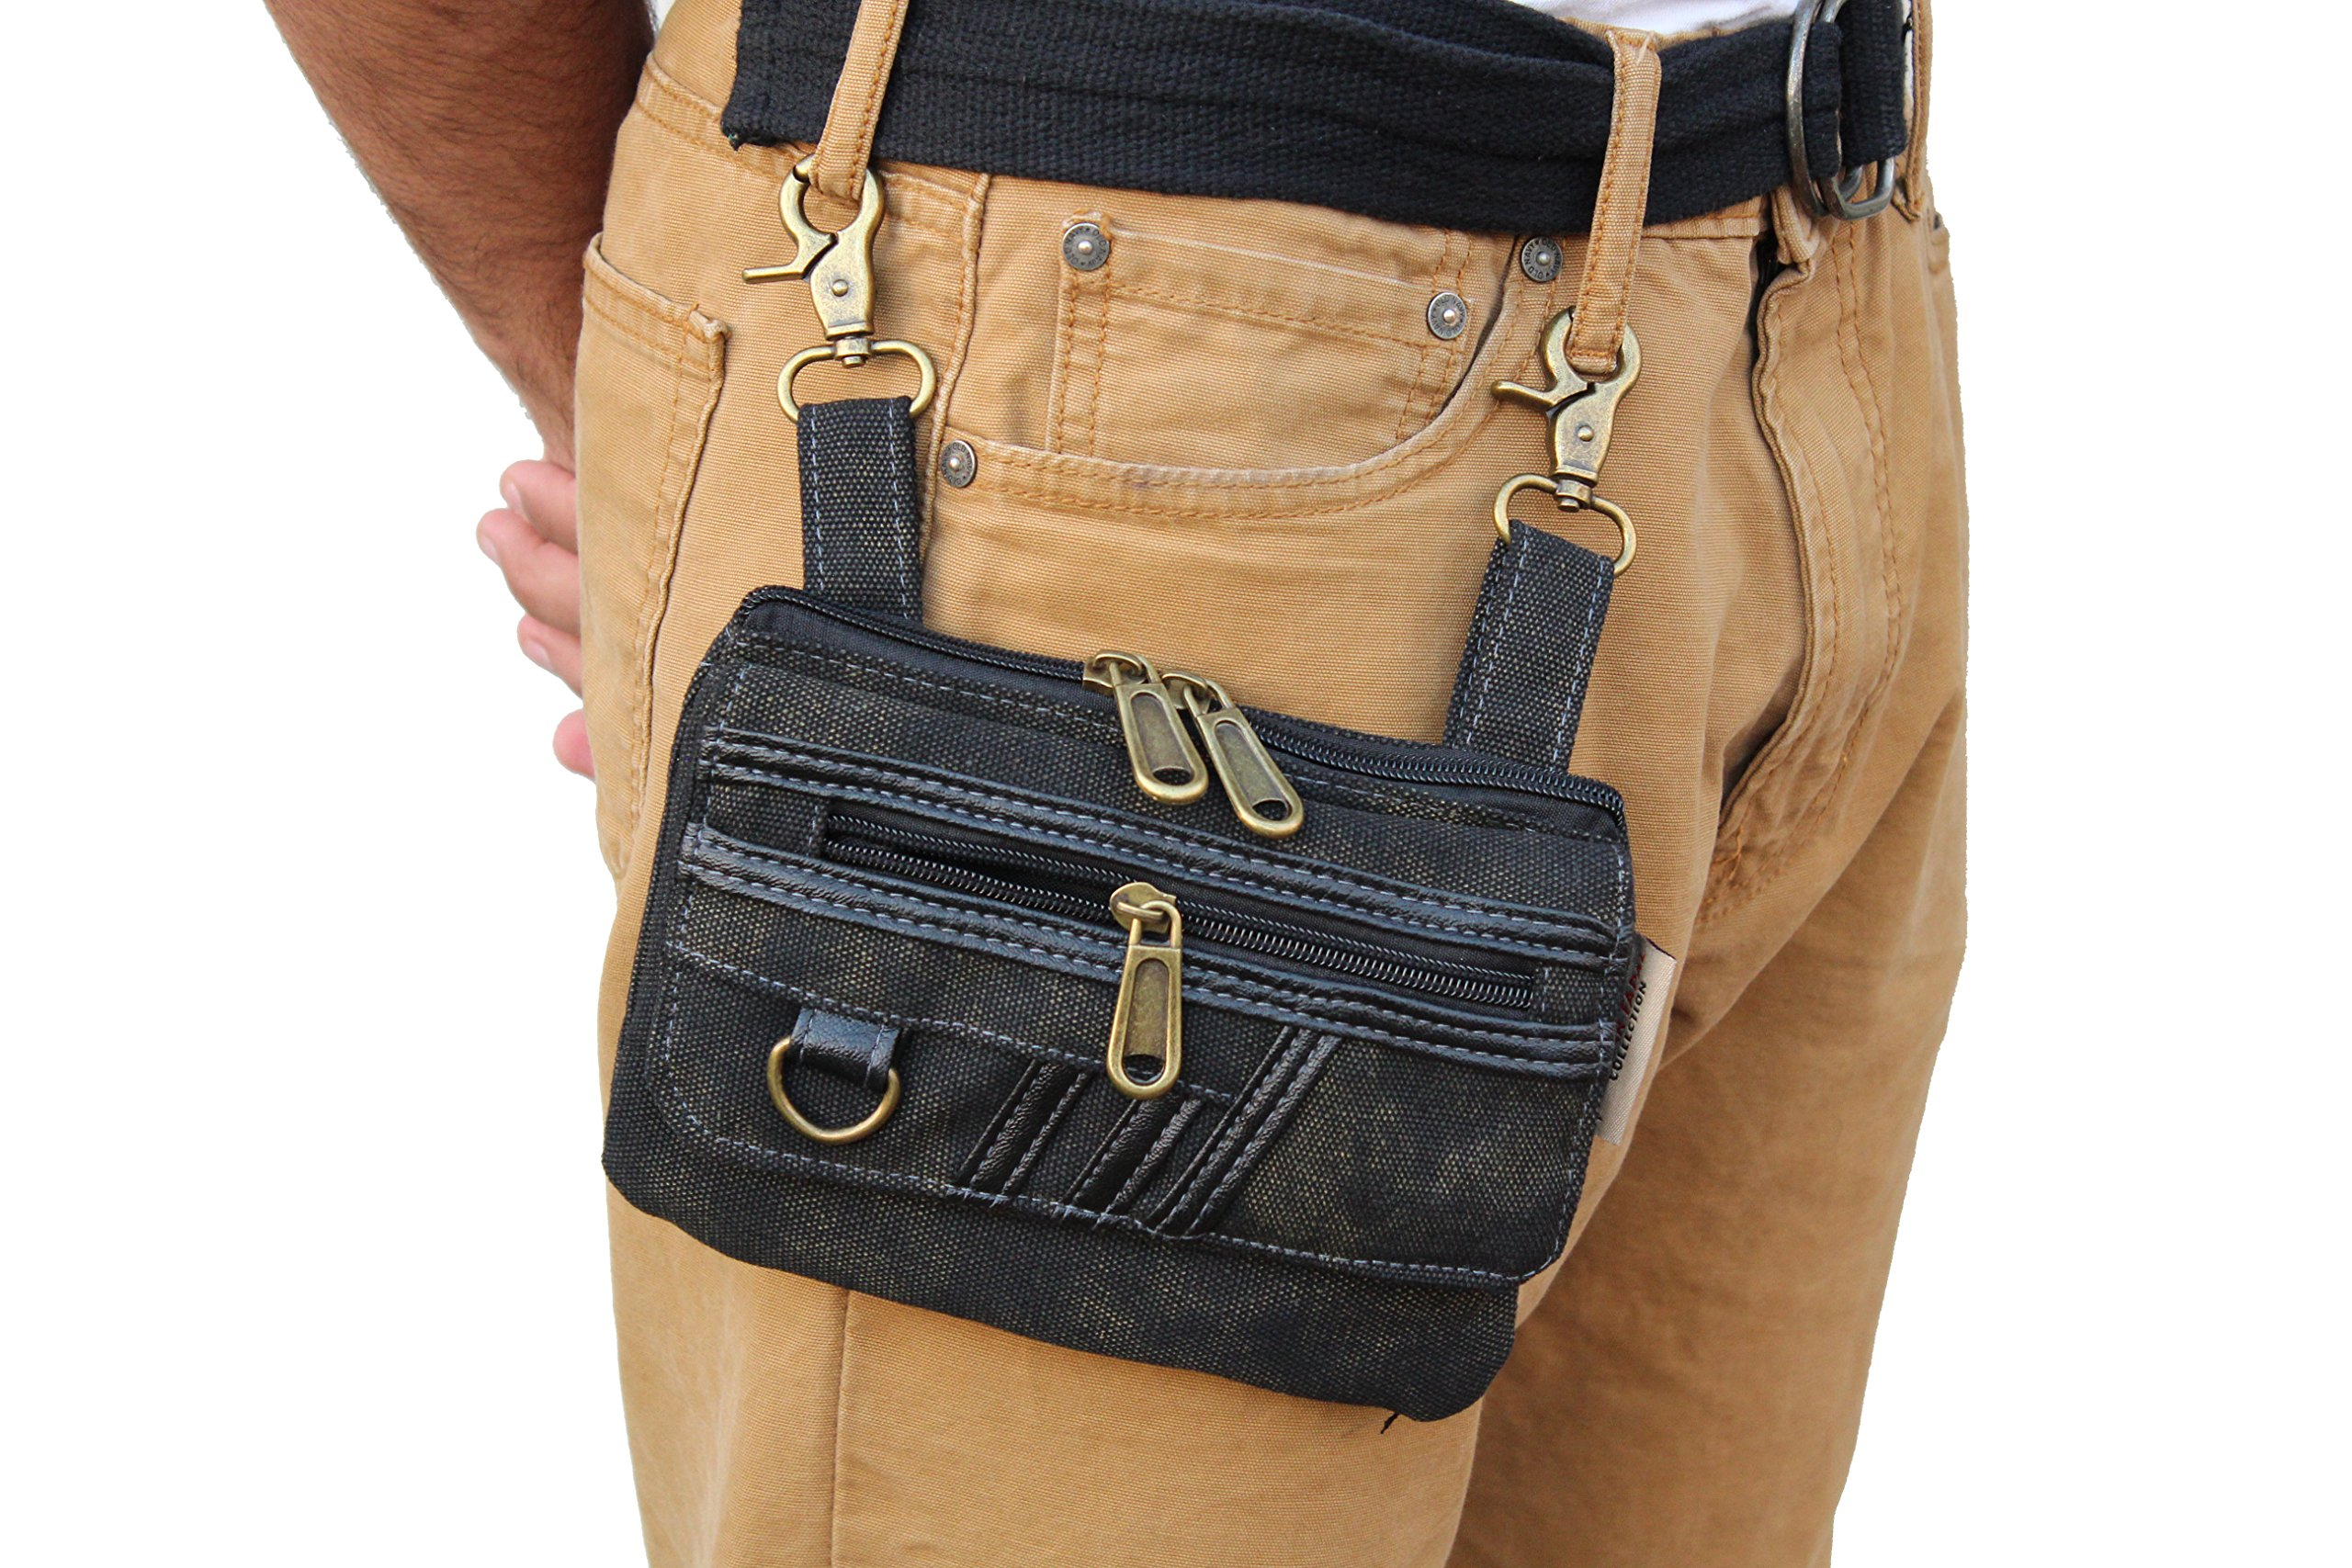 Black JTC-52-LB Stripe Loop Bag by Juzar Tapal Collection